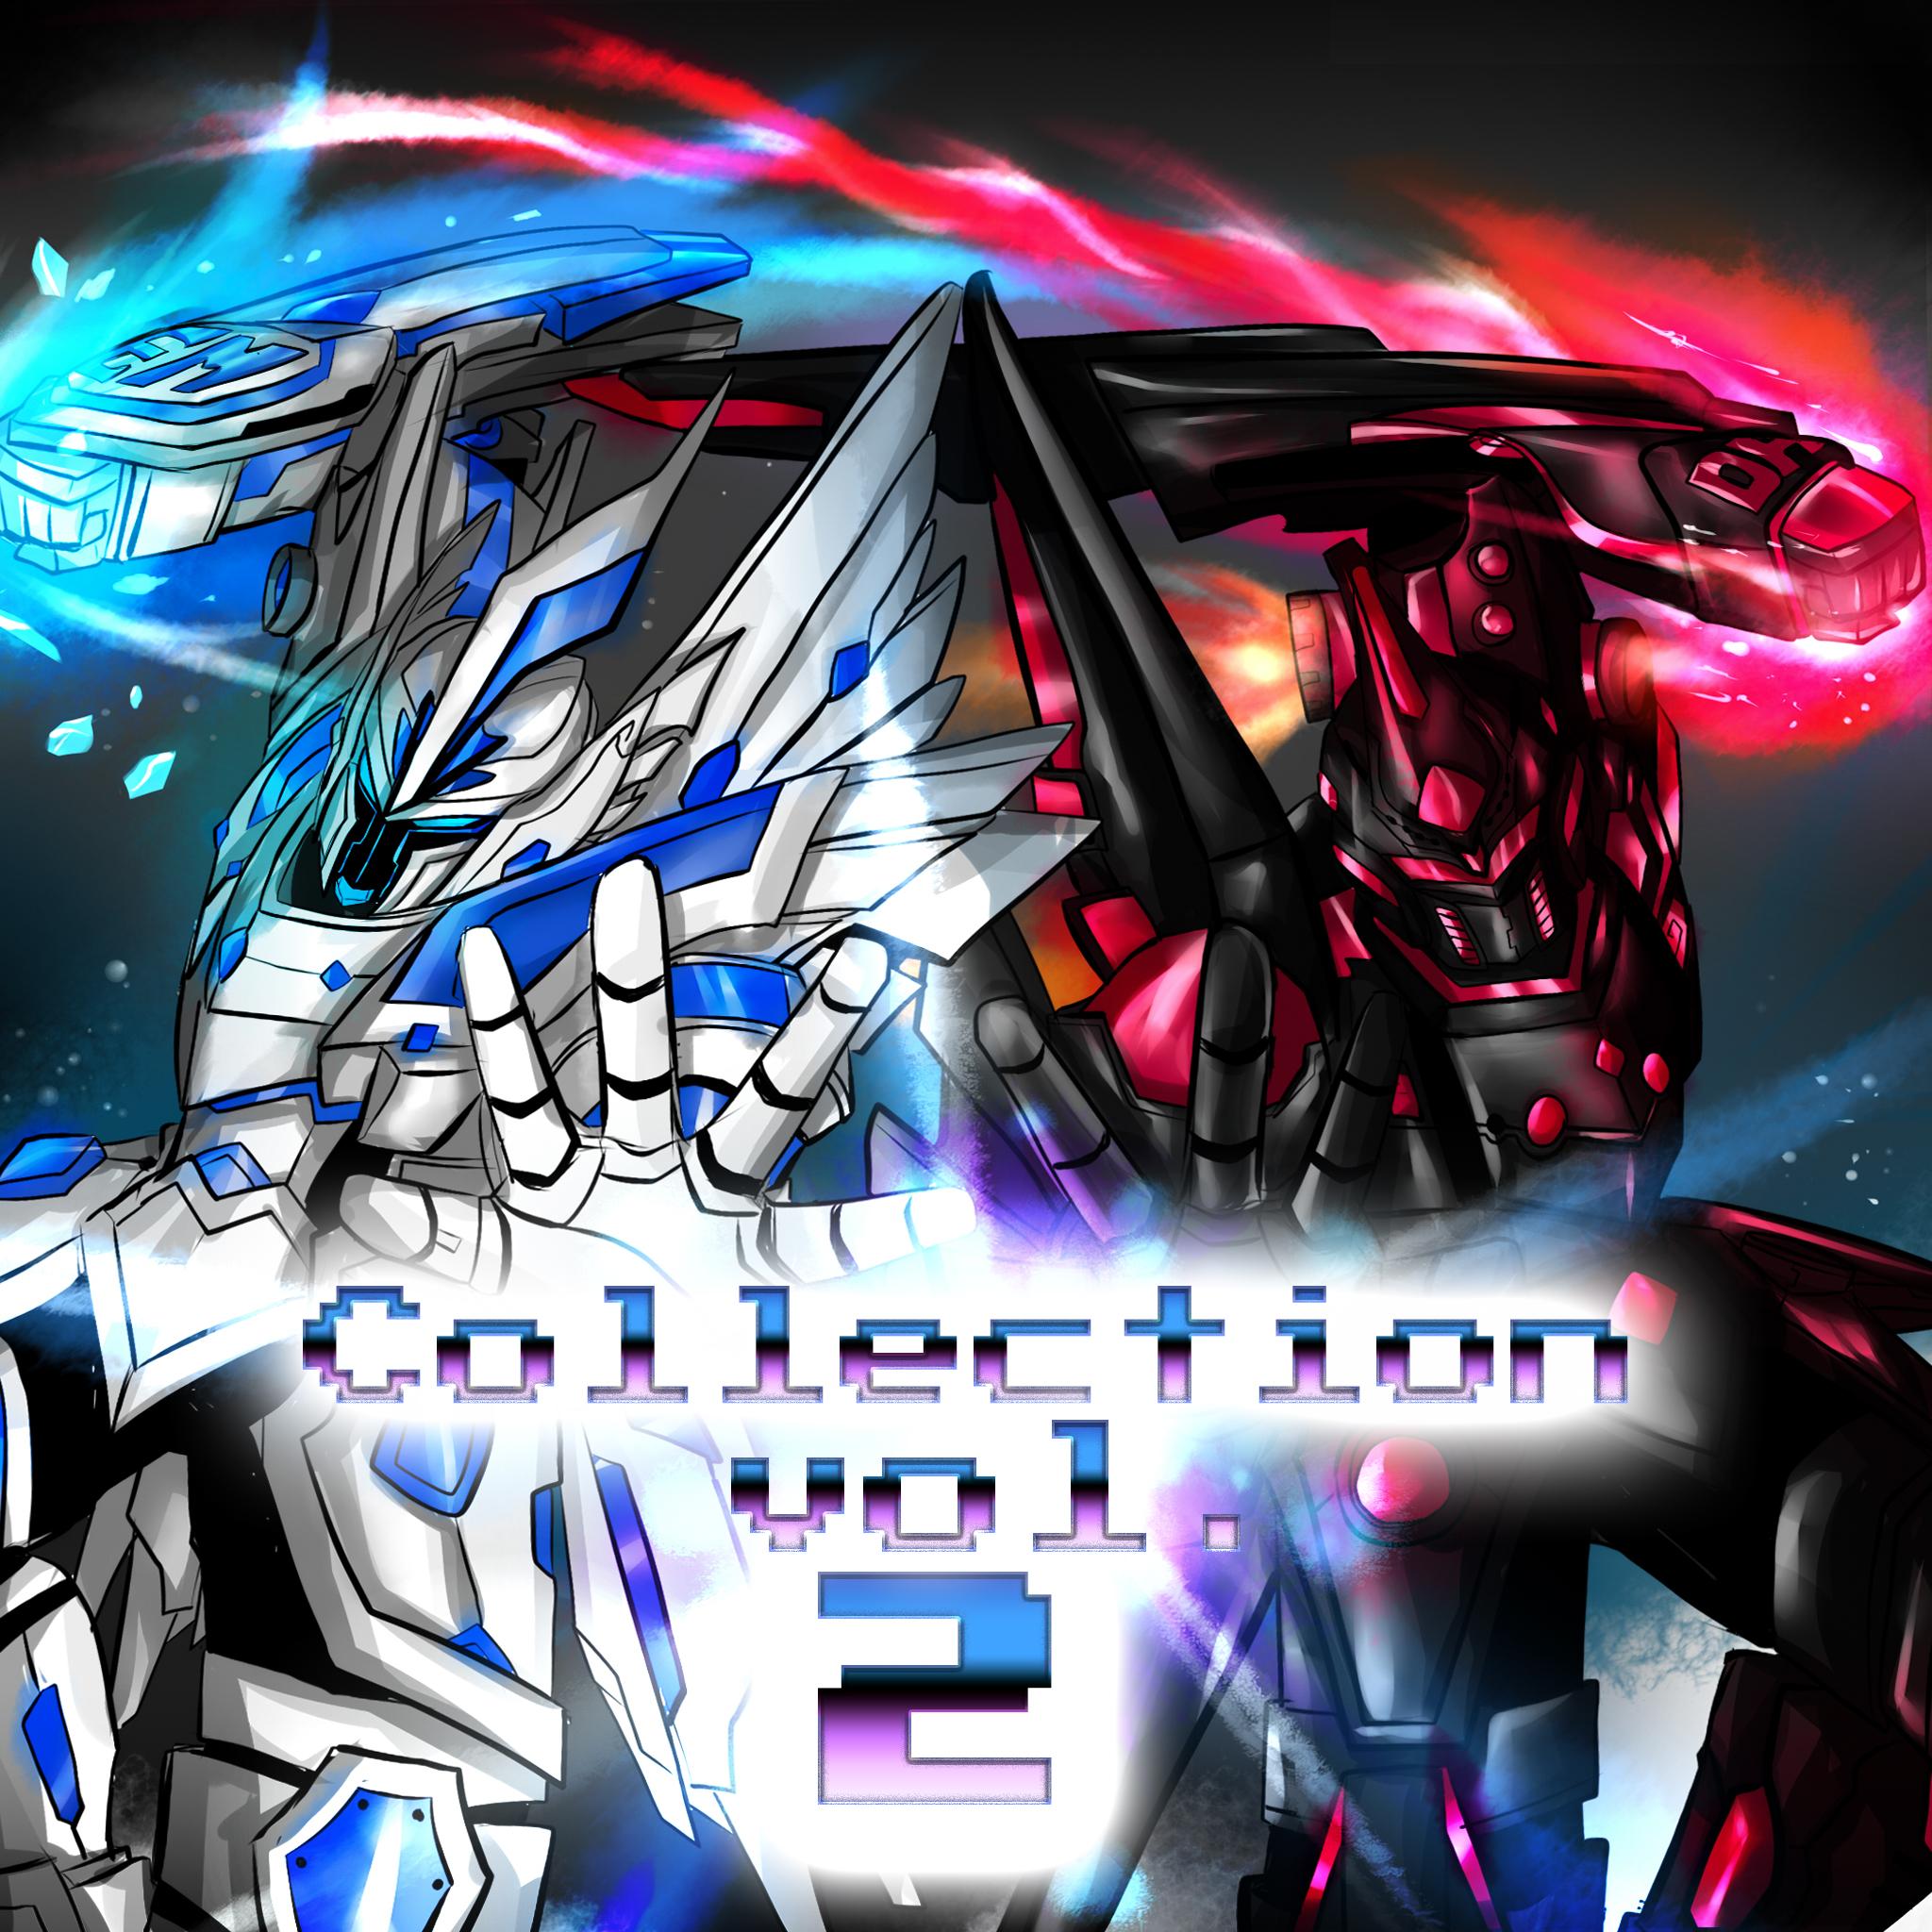 EvanxDana-Collection 2.jpg